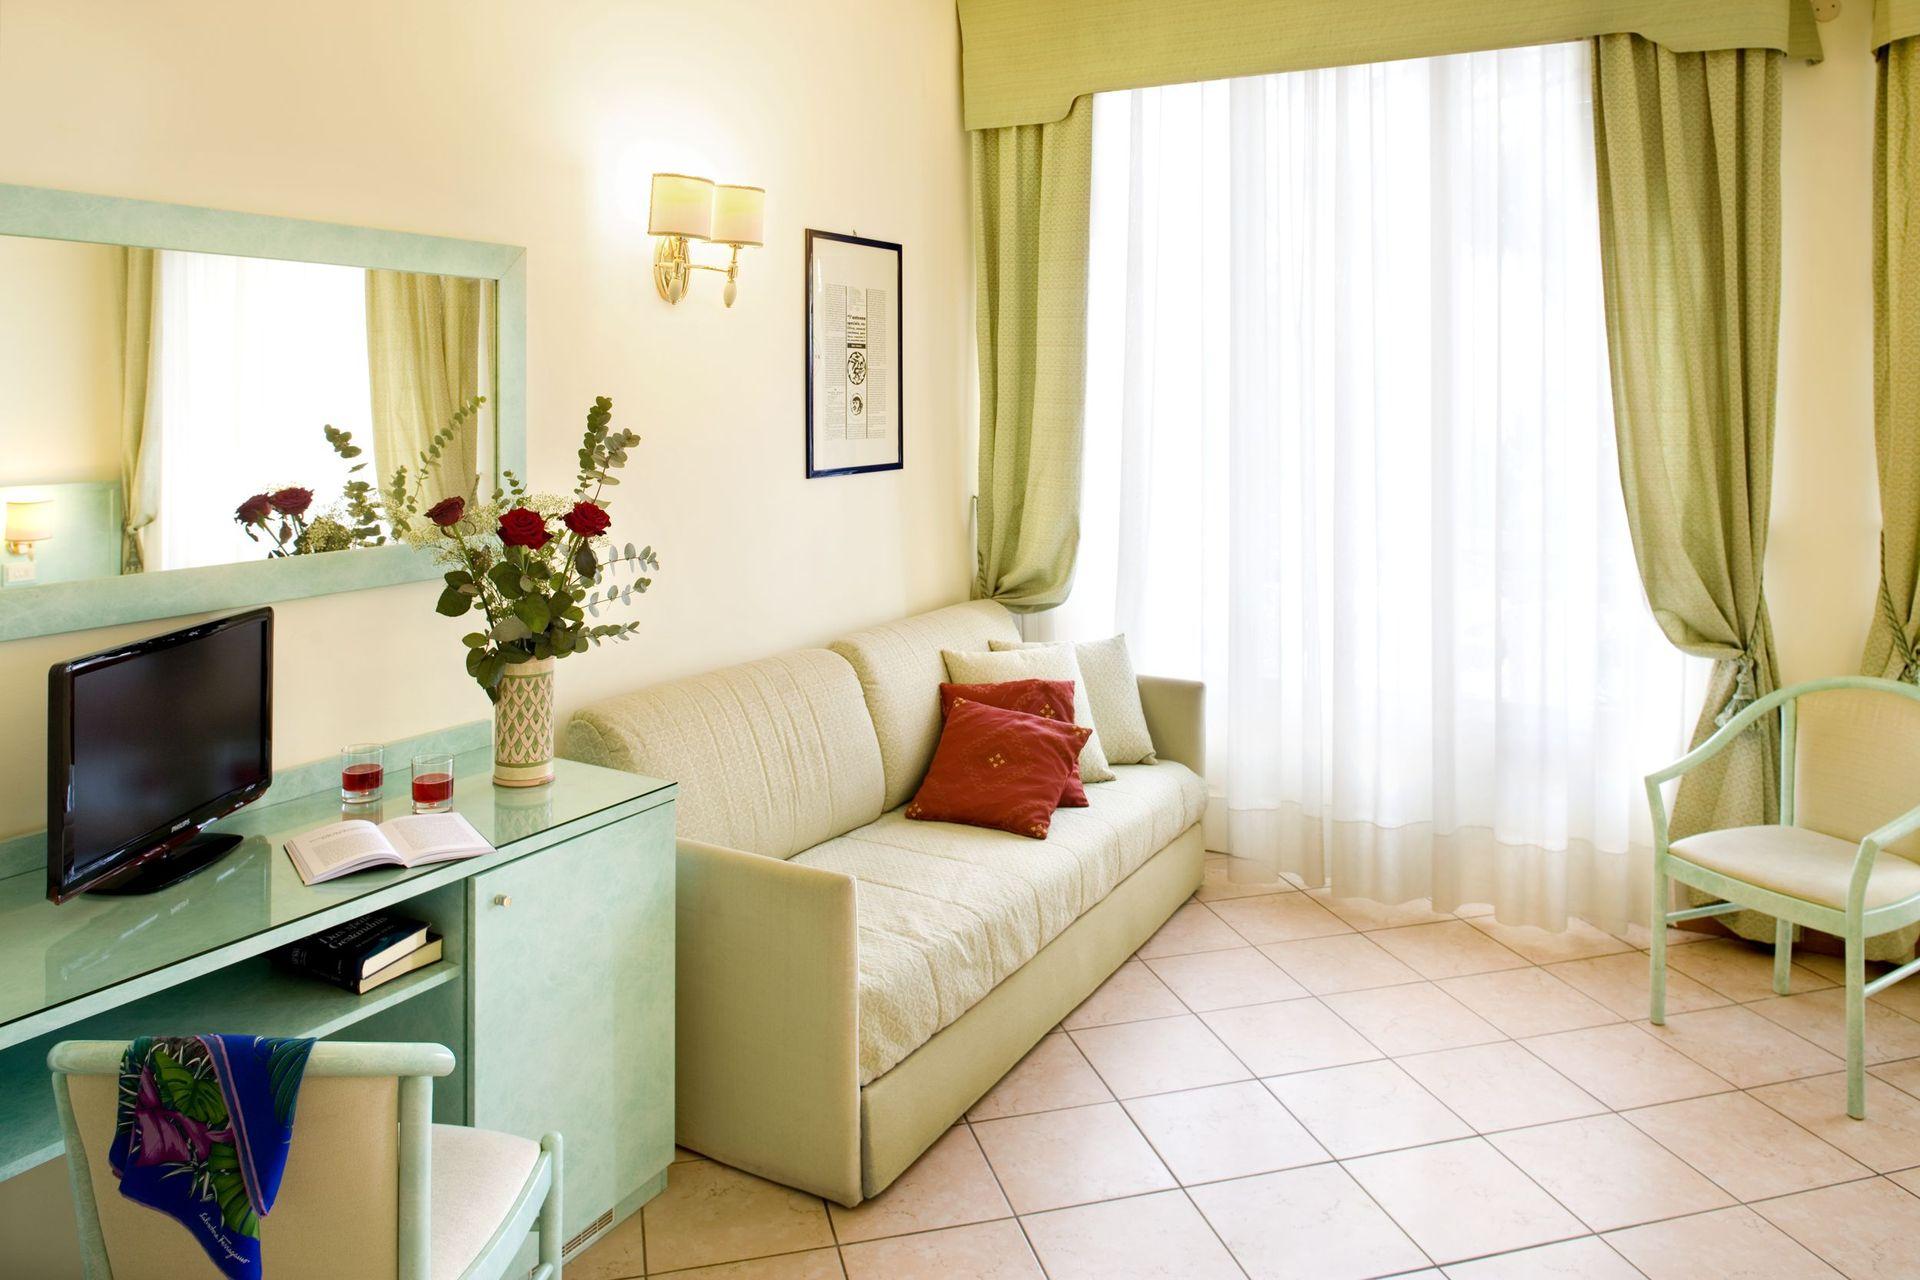 chambres l gant h tel ligurie avec balcon. Black Bedroom Furniture Sets. Home Design Ideas